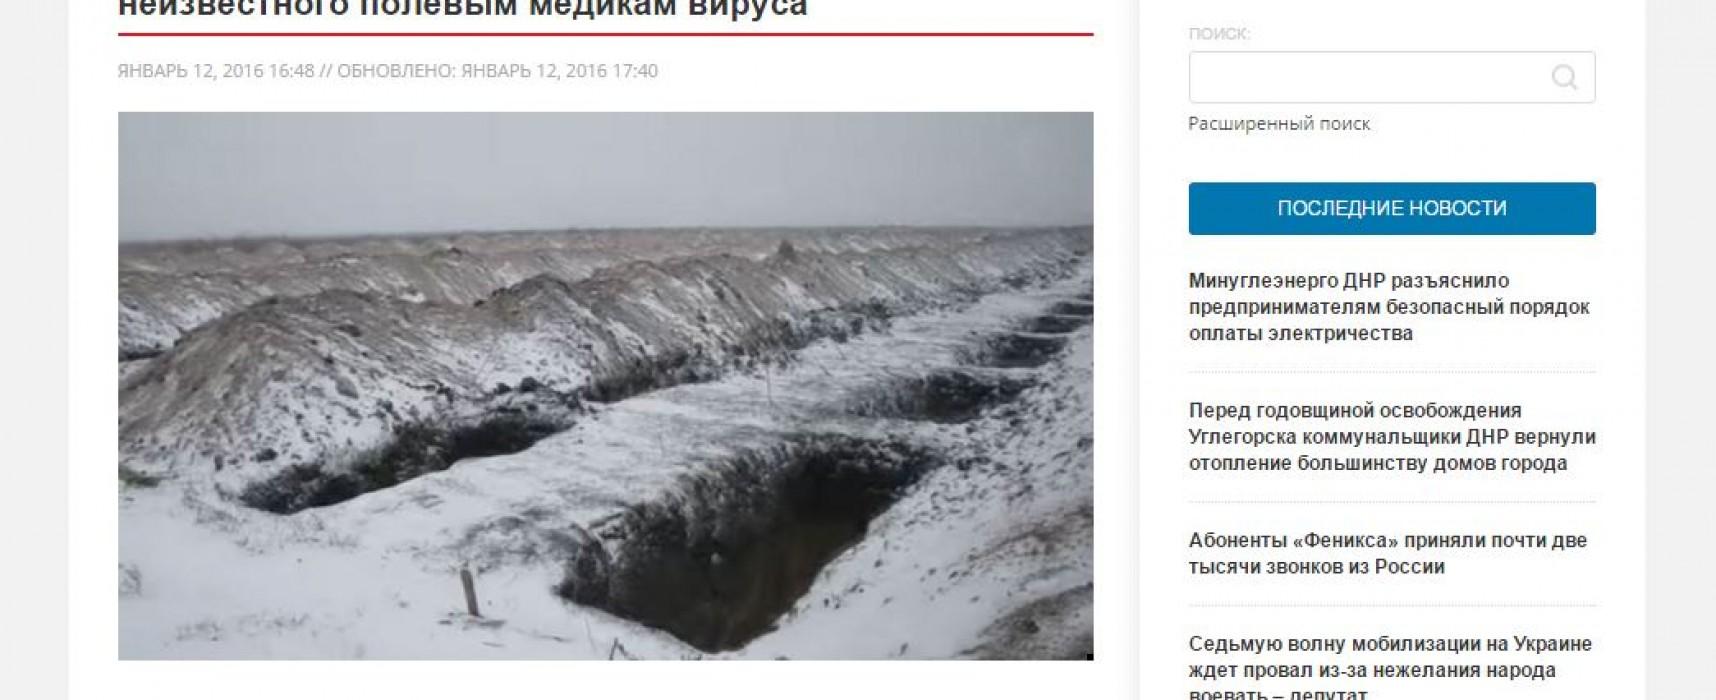 Фейк: 20 солдат погибли из-за утечки вируса под Харьковом